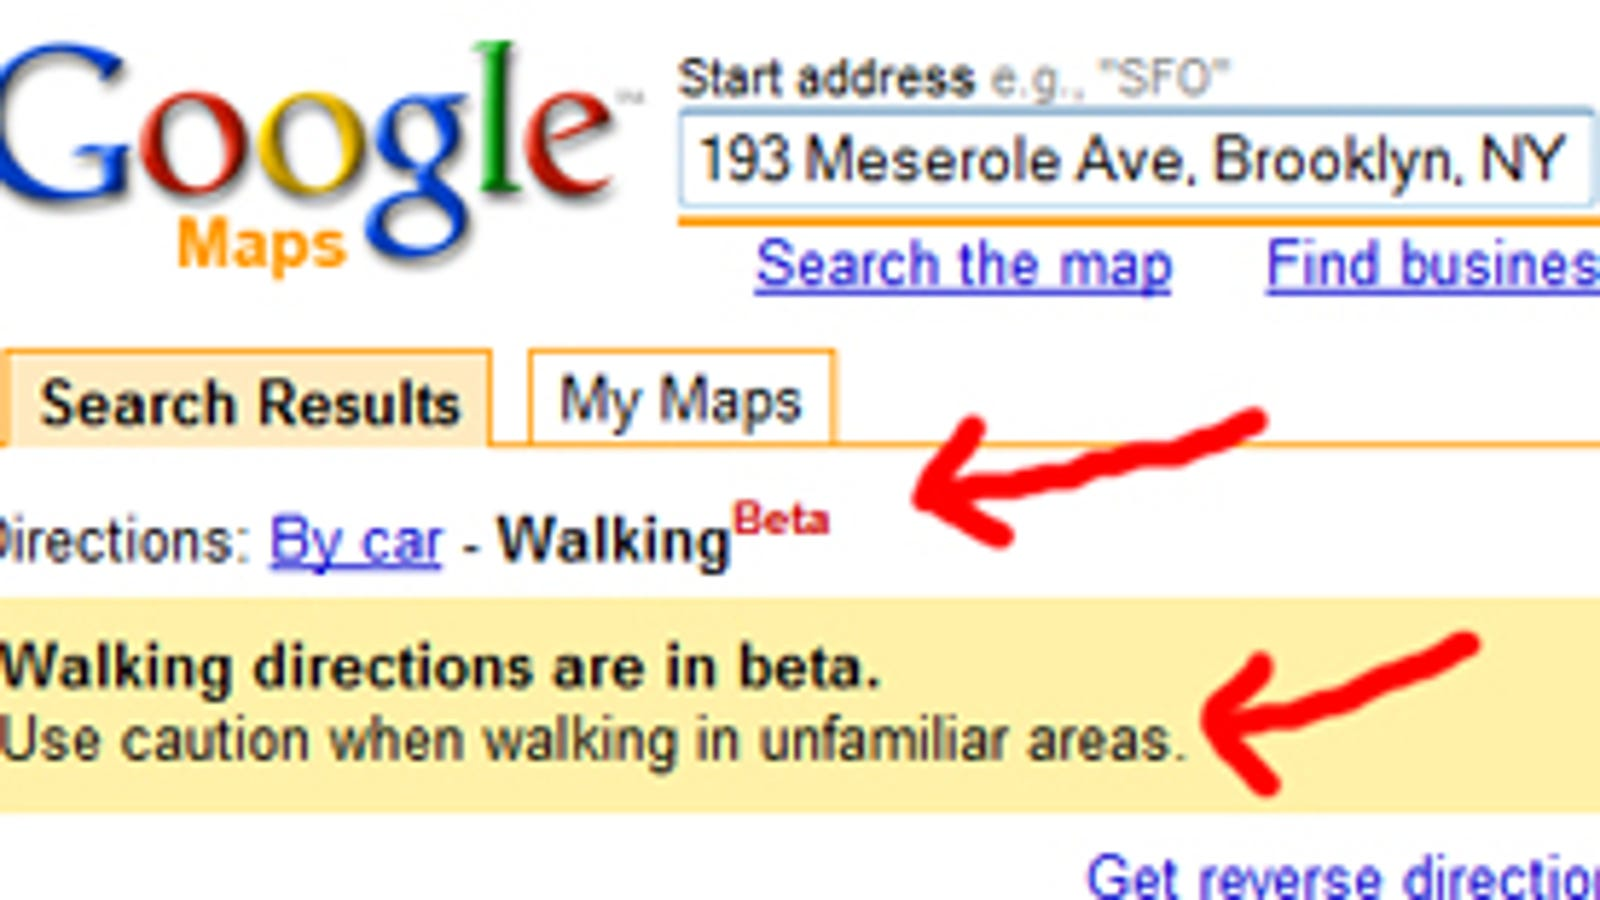 google maps adds walking directions bad neighborhood caution